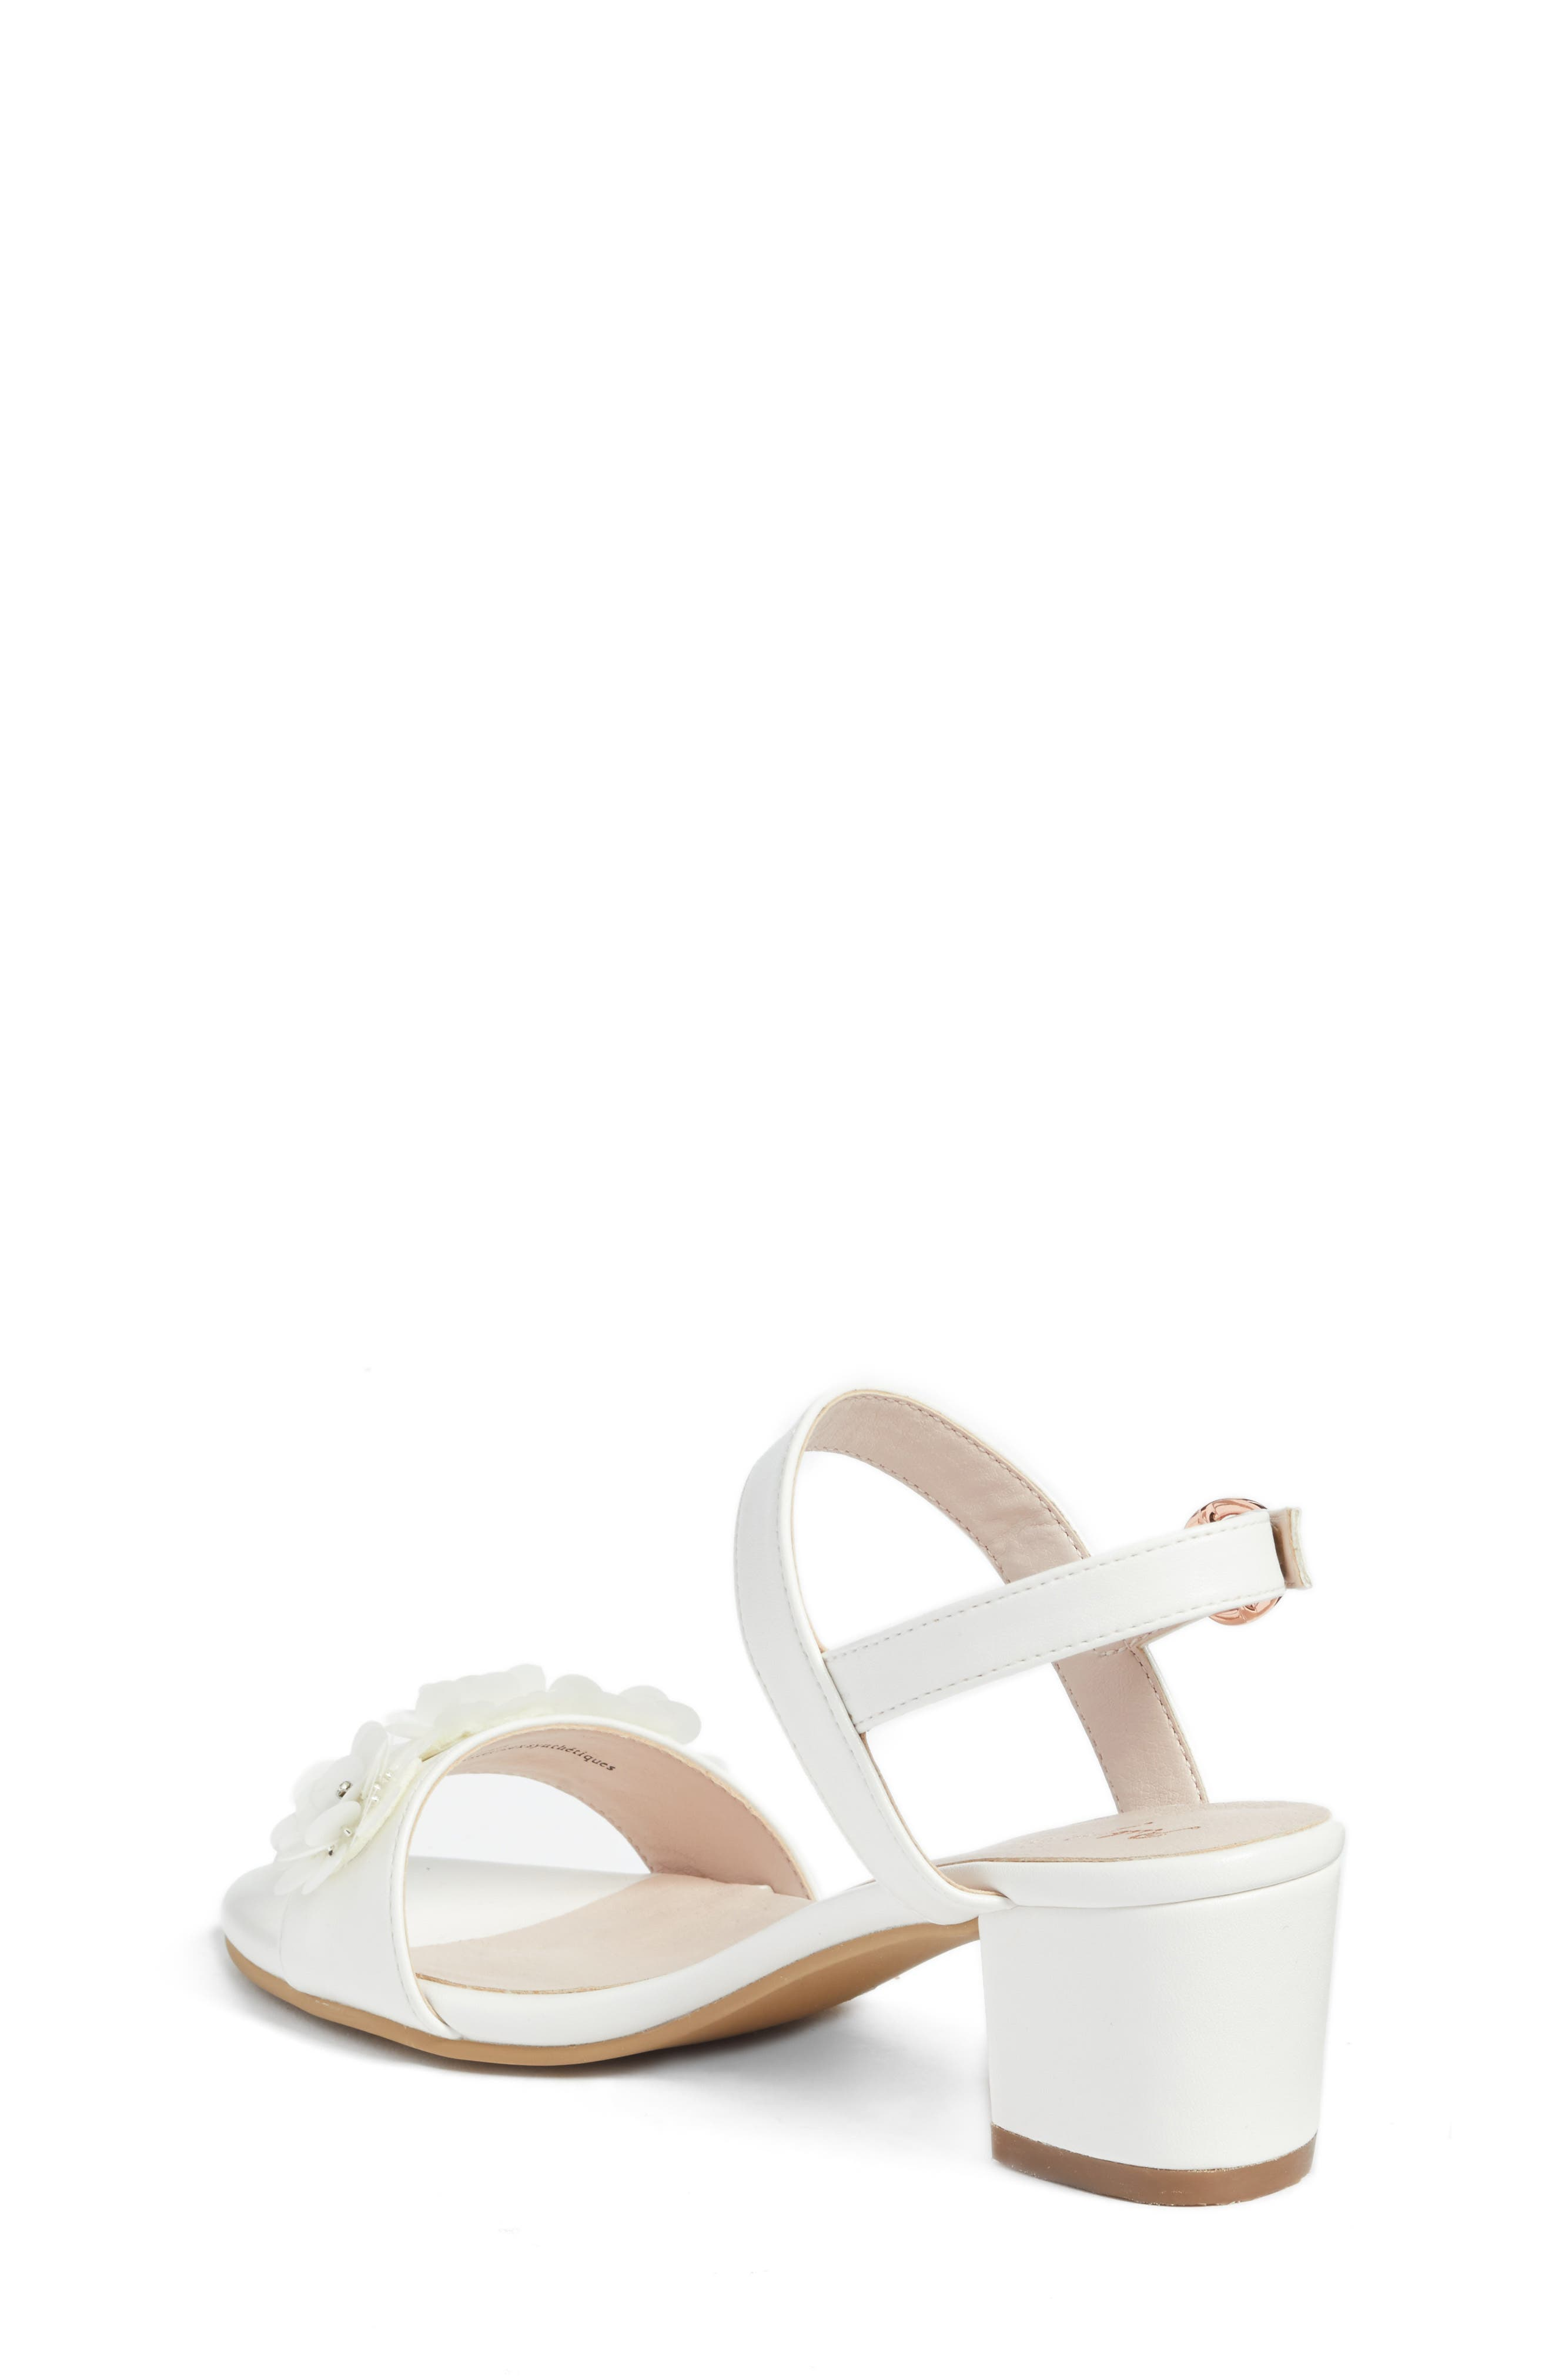 Dina Flowered Sandal,                             Alternate thumbnail 2, color,                             White Faux Leather